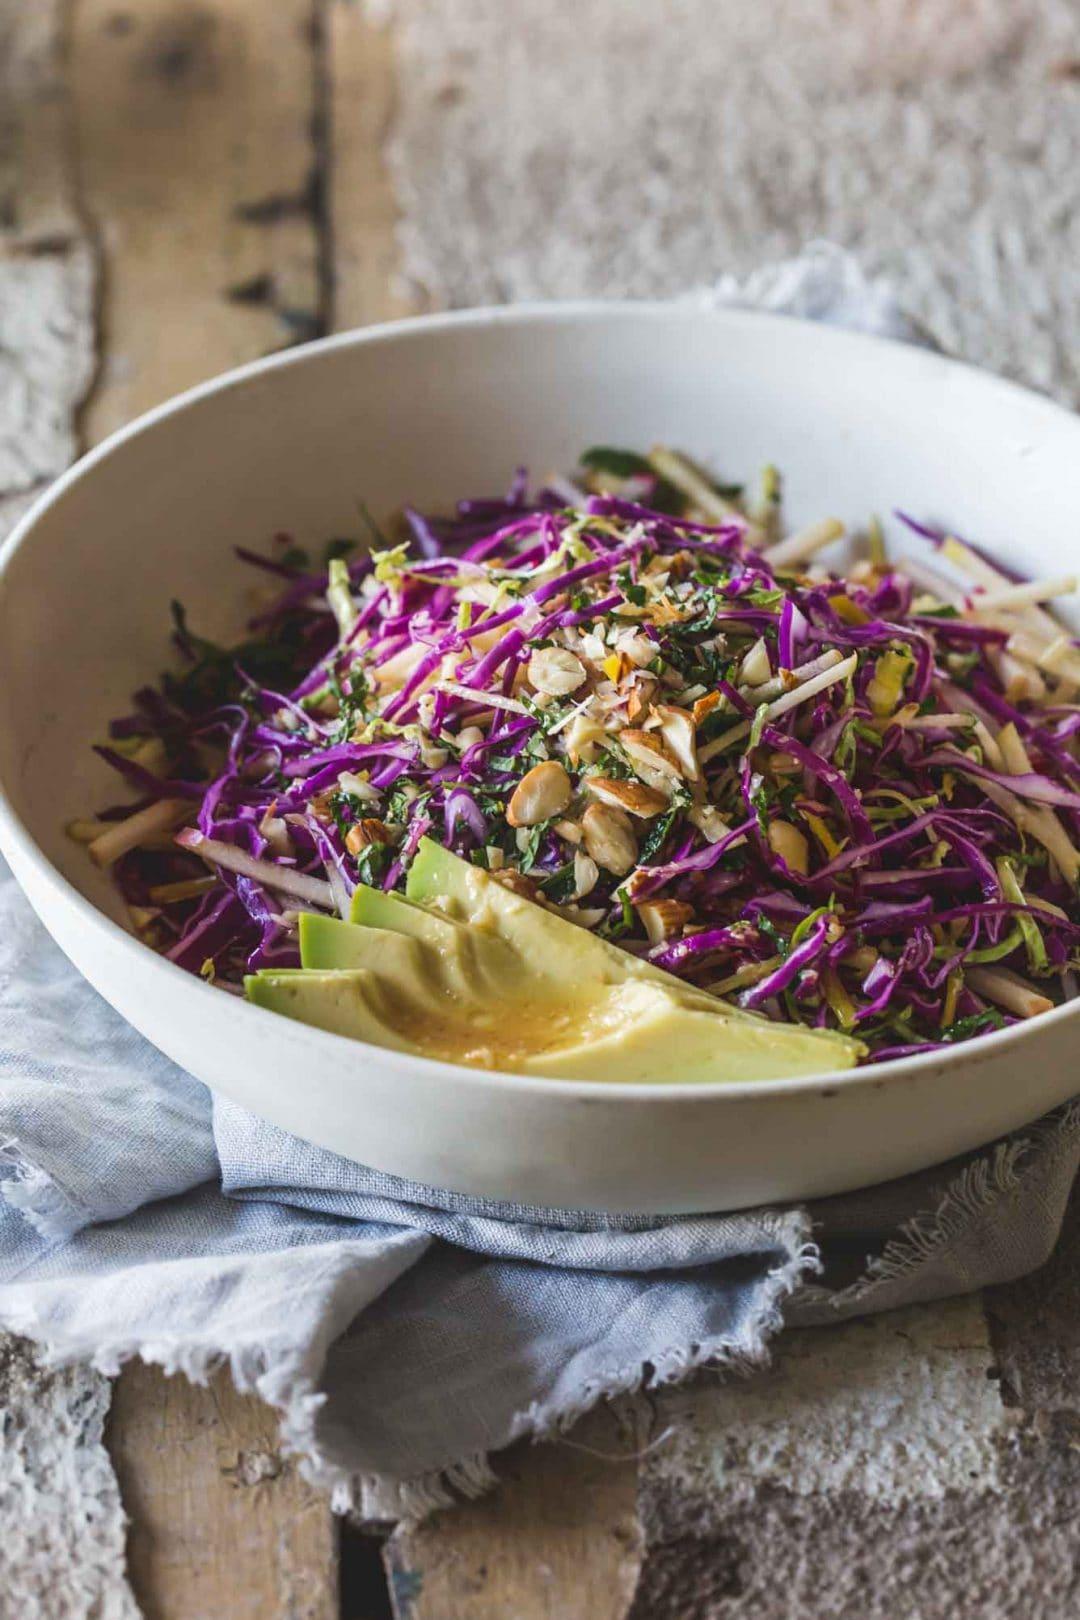 40 delicious & healthy vegan salad recipes picture of detox slaw salad for recipe roundup